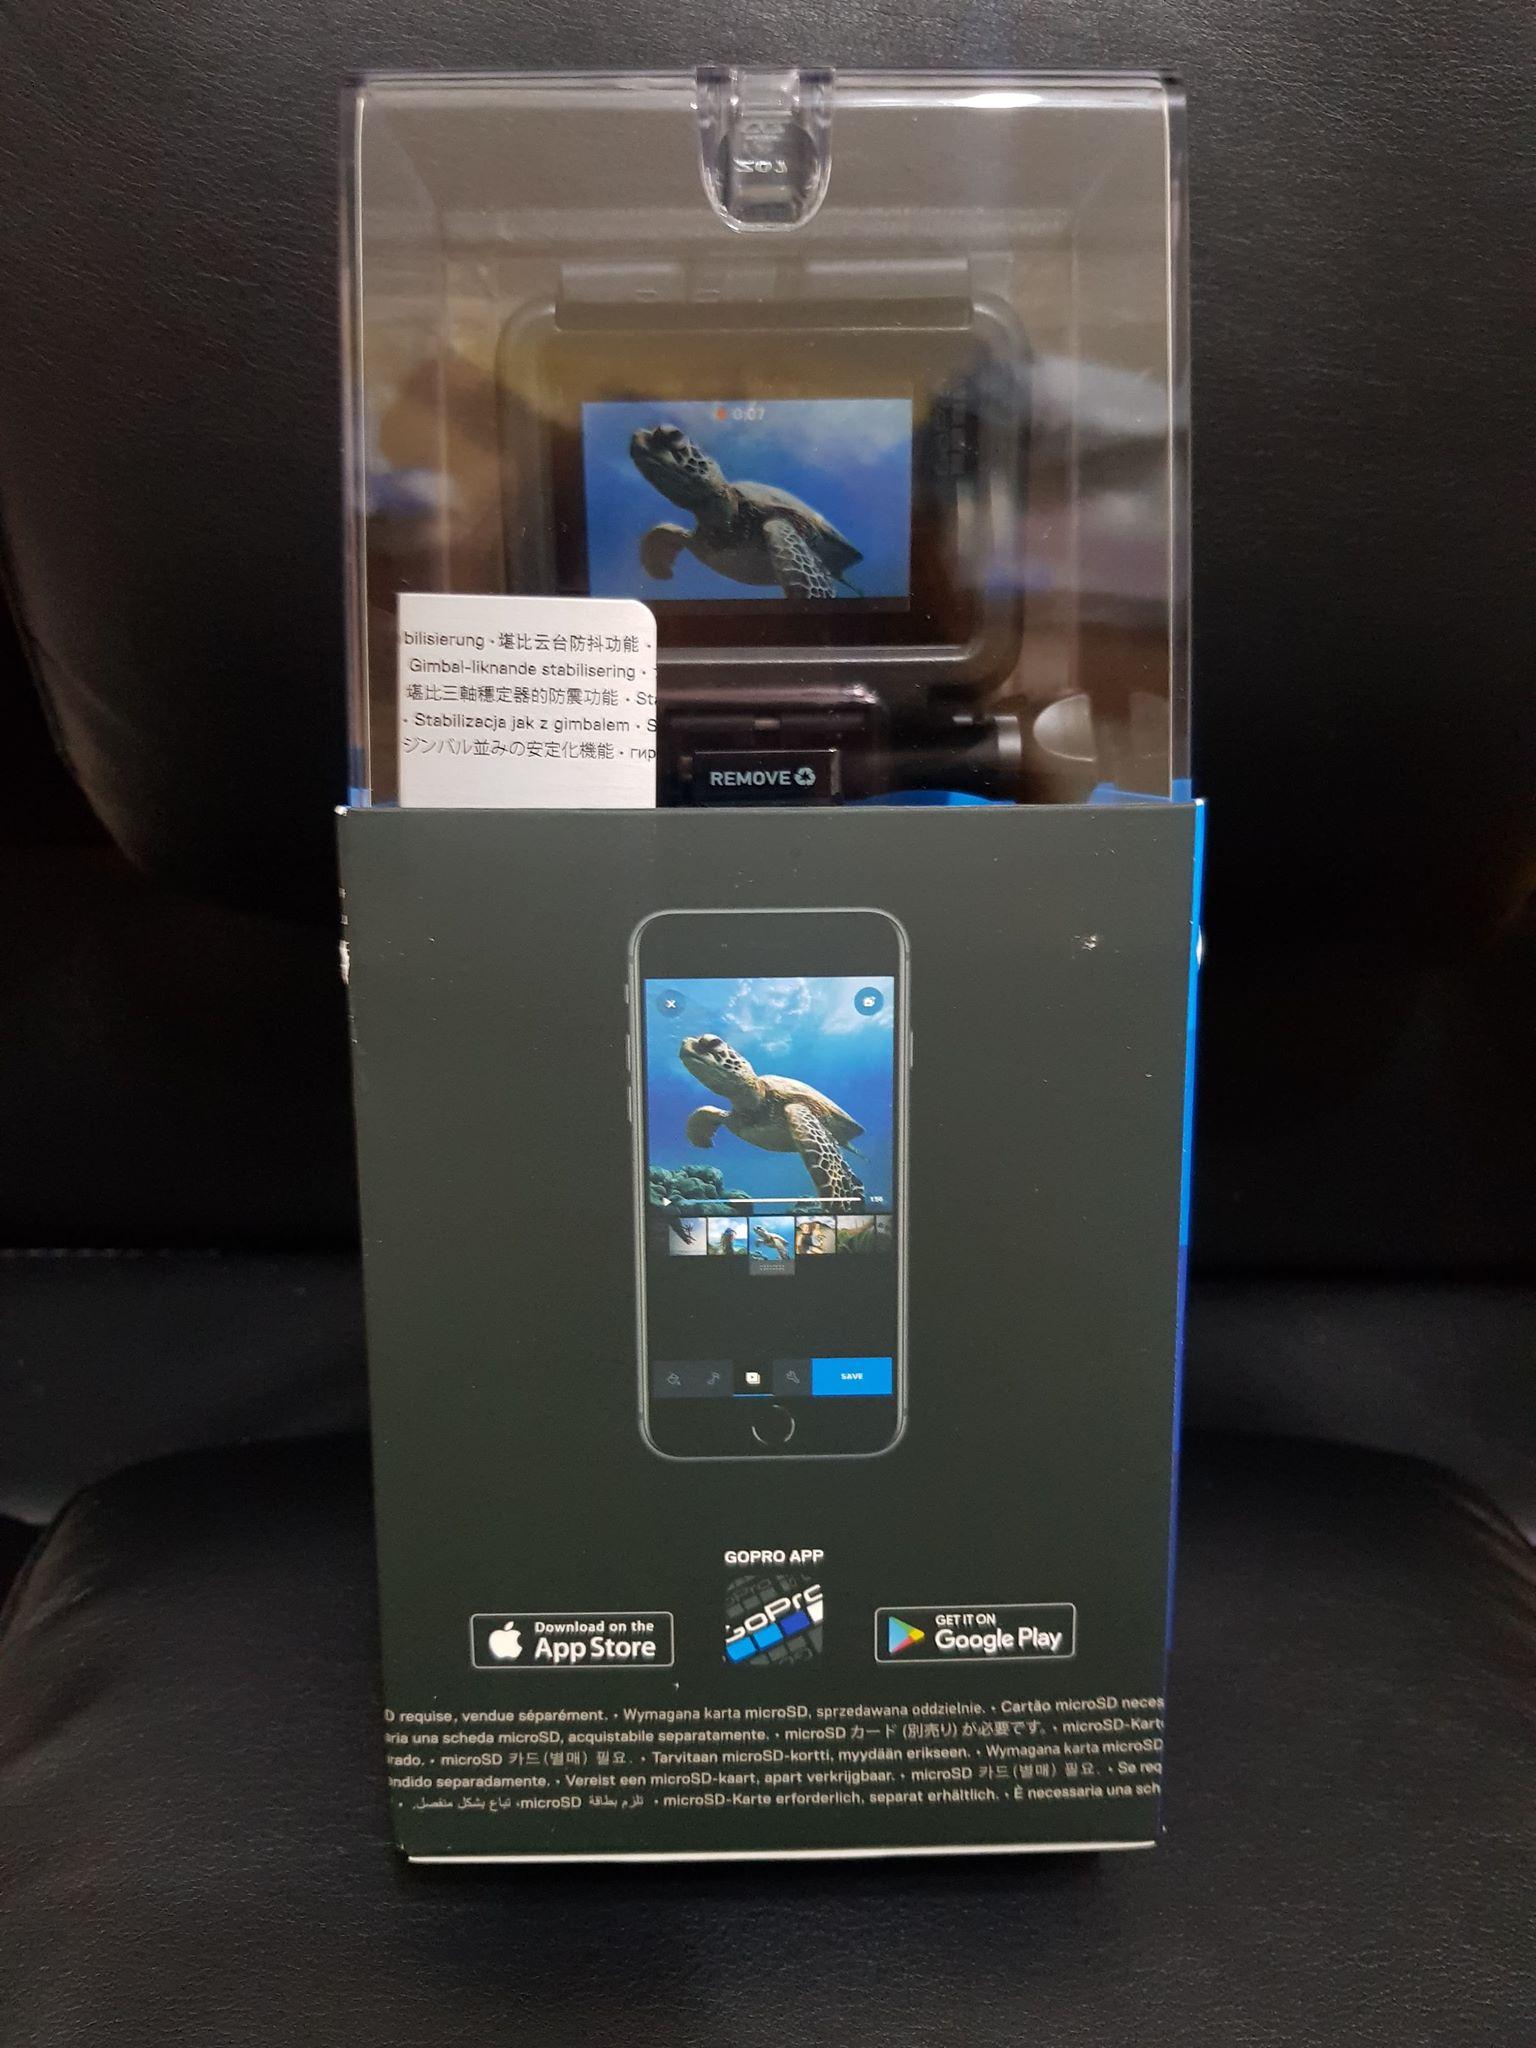 GOPRO HERO 7 BLACK 高機能運動攝影機 現貨一台 下單前請先私訊line appie3692